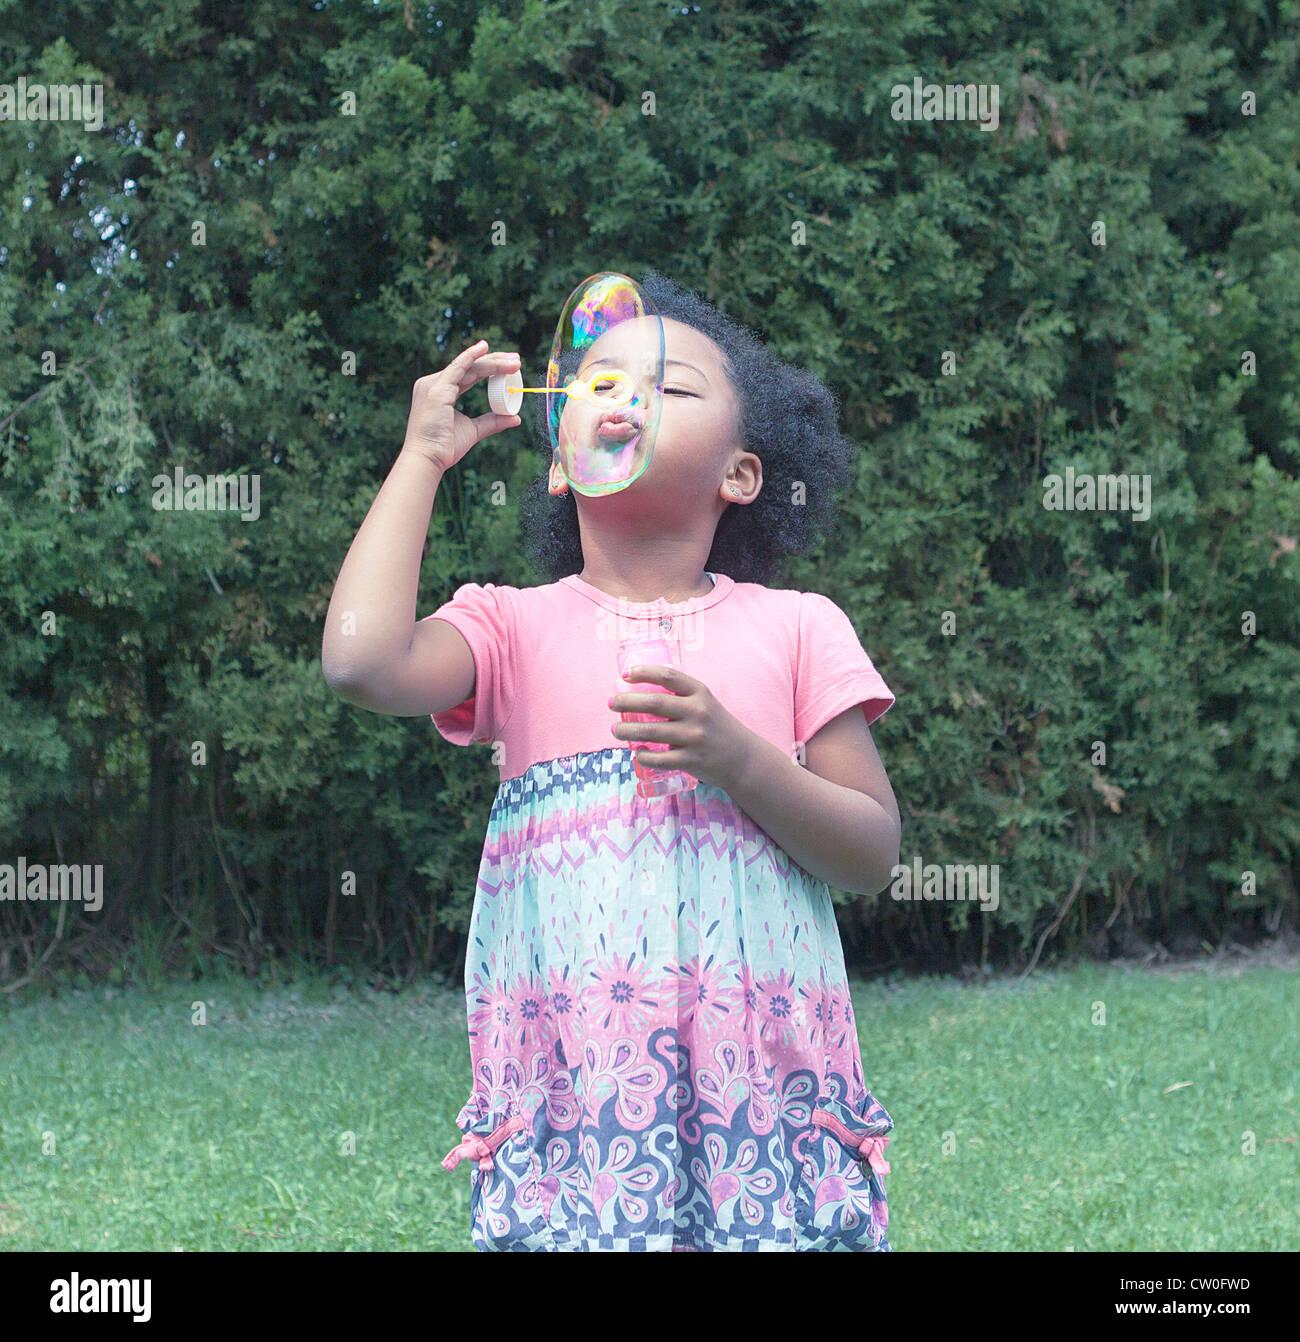 Mädchen bläst Luftblasen im freien Stockbild